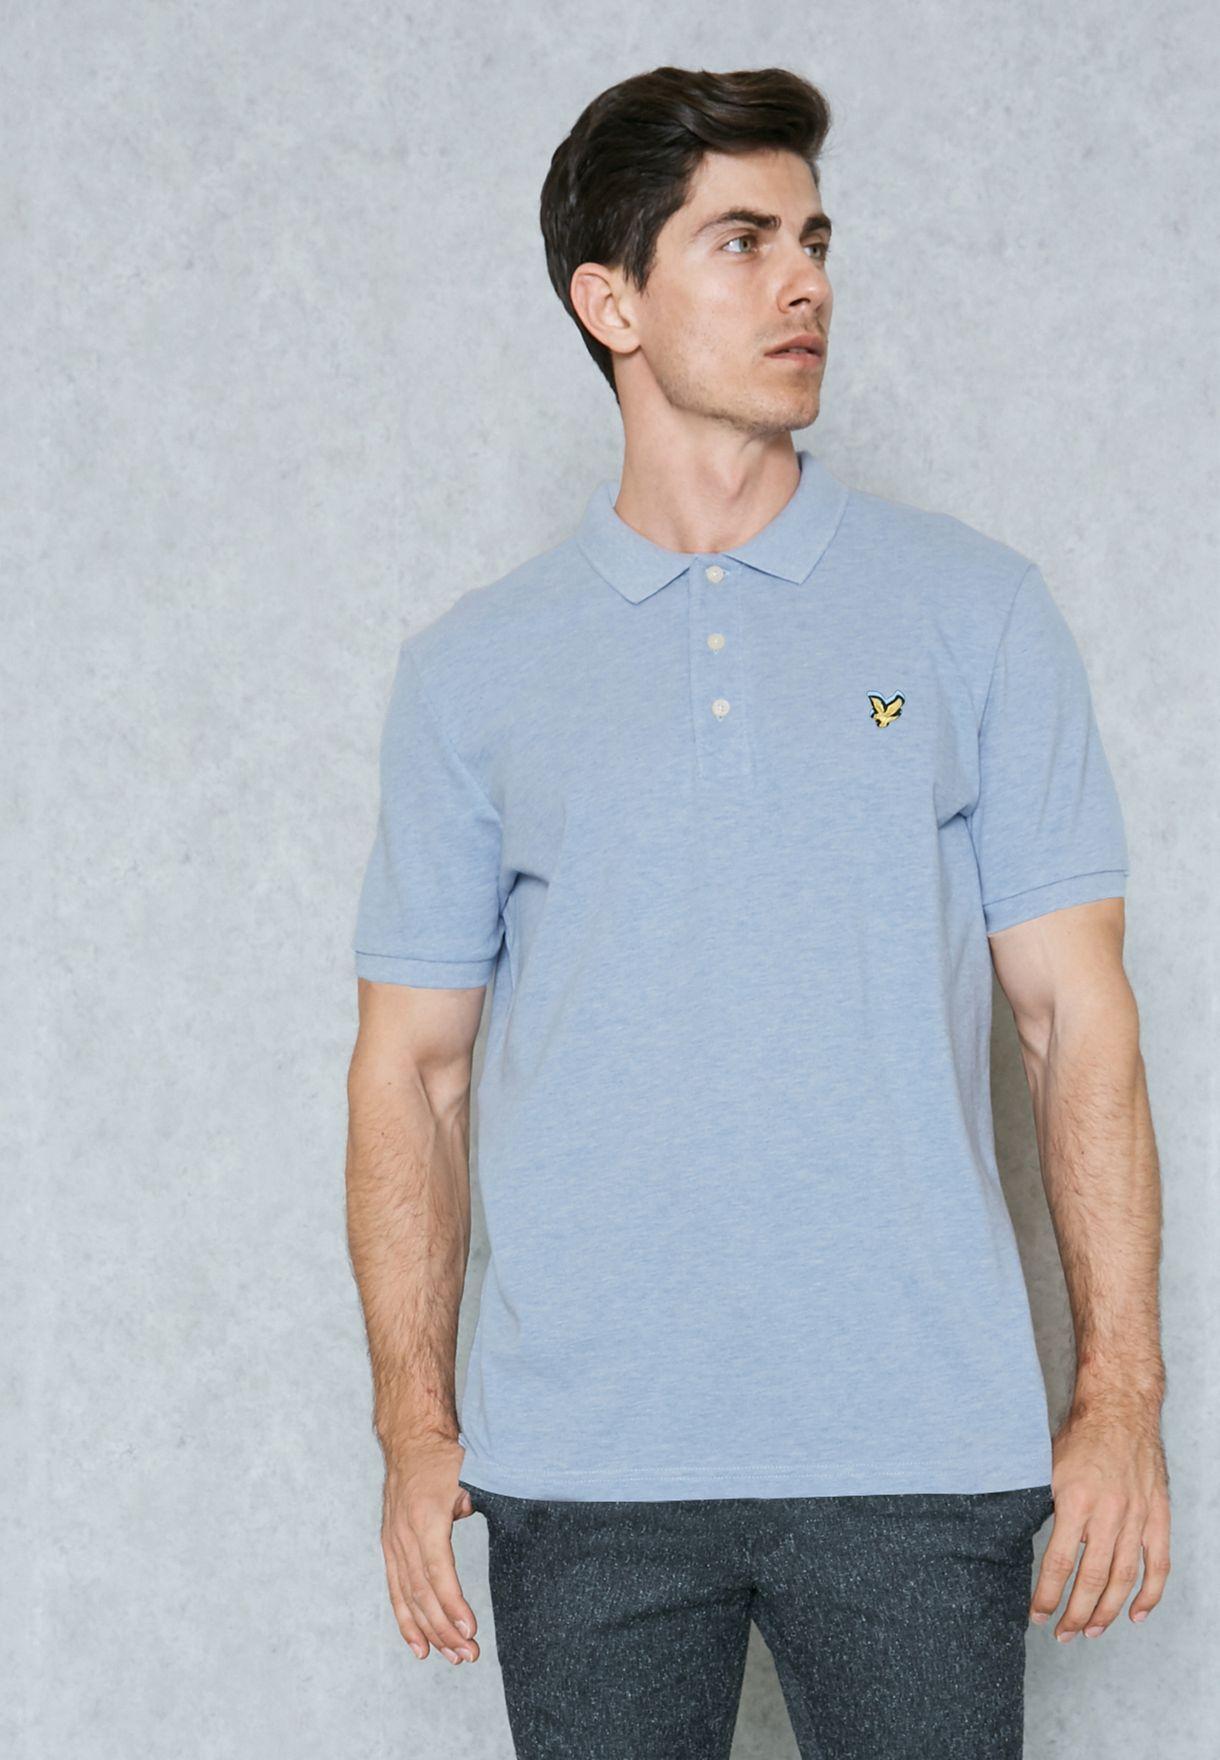 e1e0e195a Shop Lyle Scott blue Polo Shirt SP400VM for Men in Globally ...